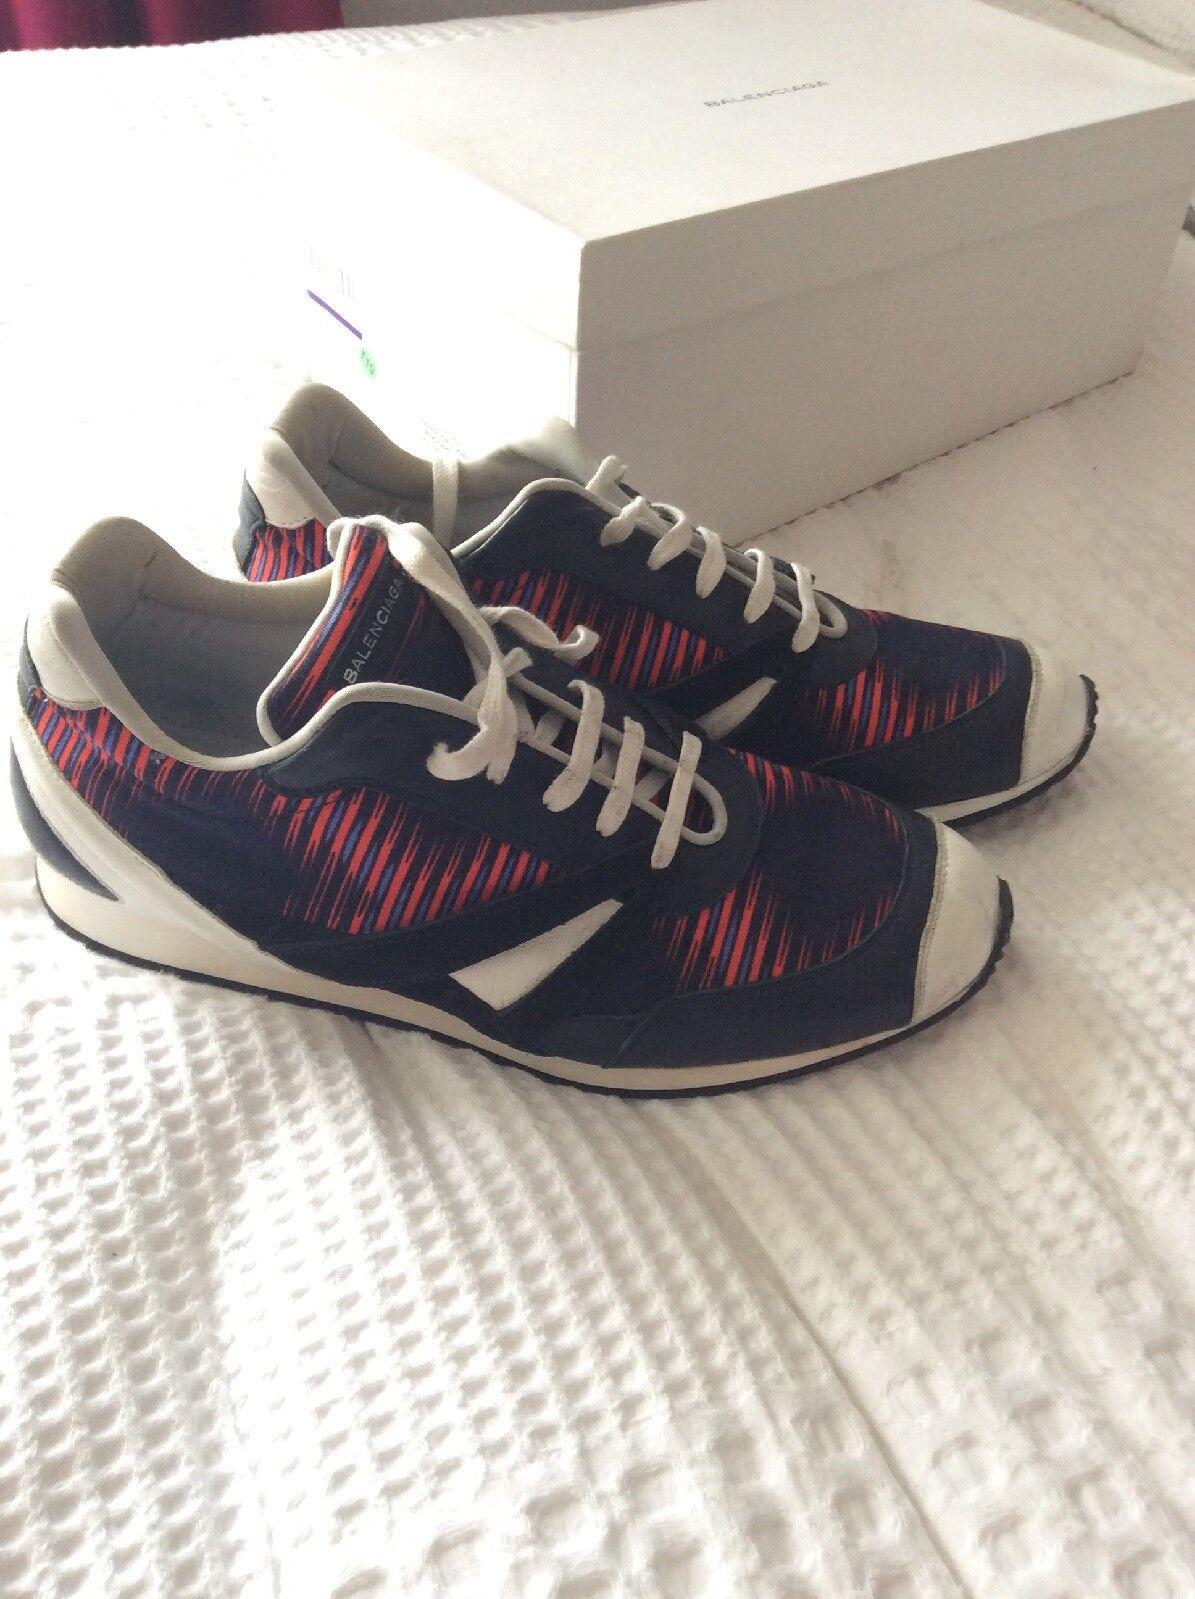 Balenciaga Runner Sneakers Nicolas Ghesquiere Era 42 100% Authentic